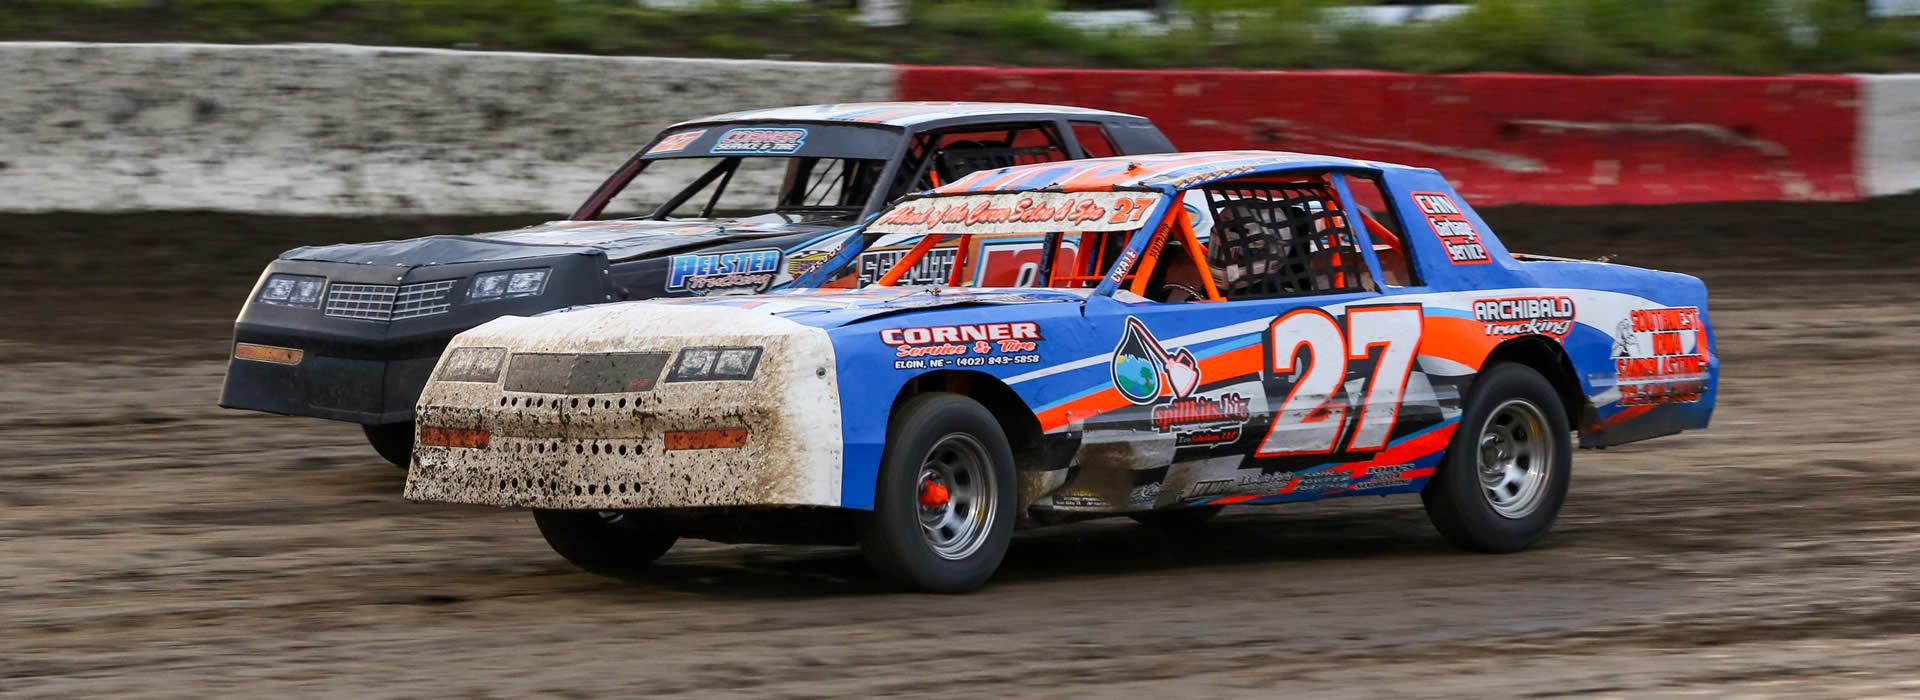 kids box car races veterans night nascar weekly racing series no hobby stocks